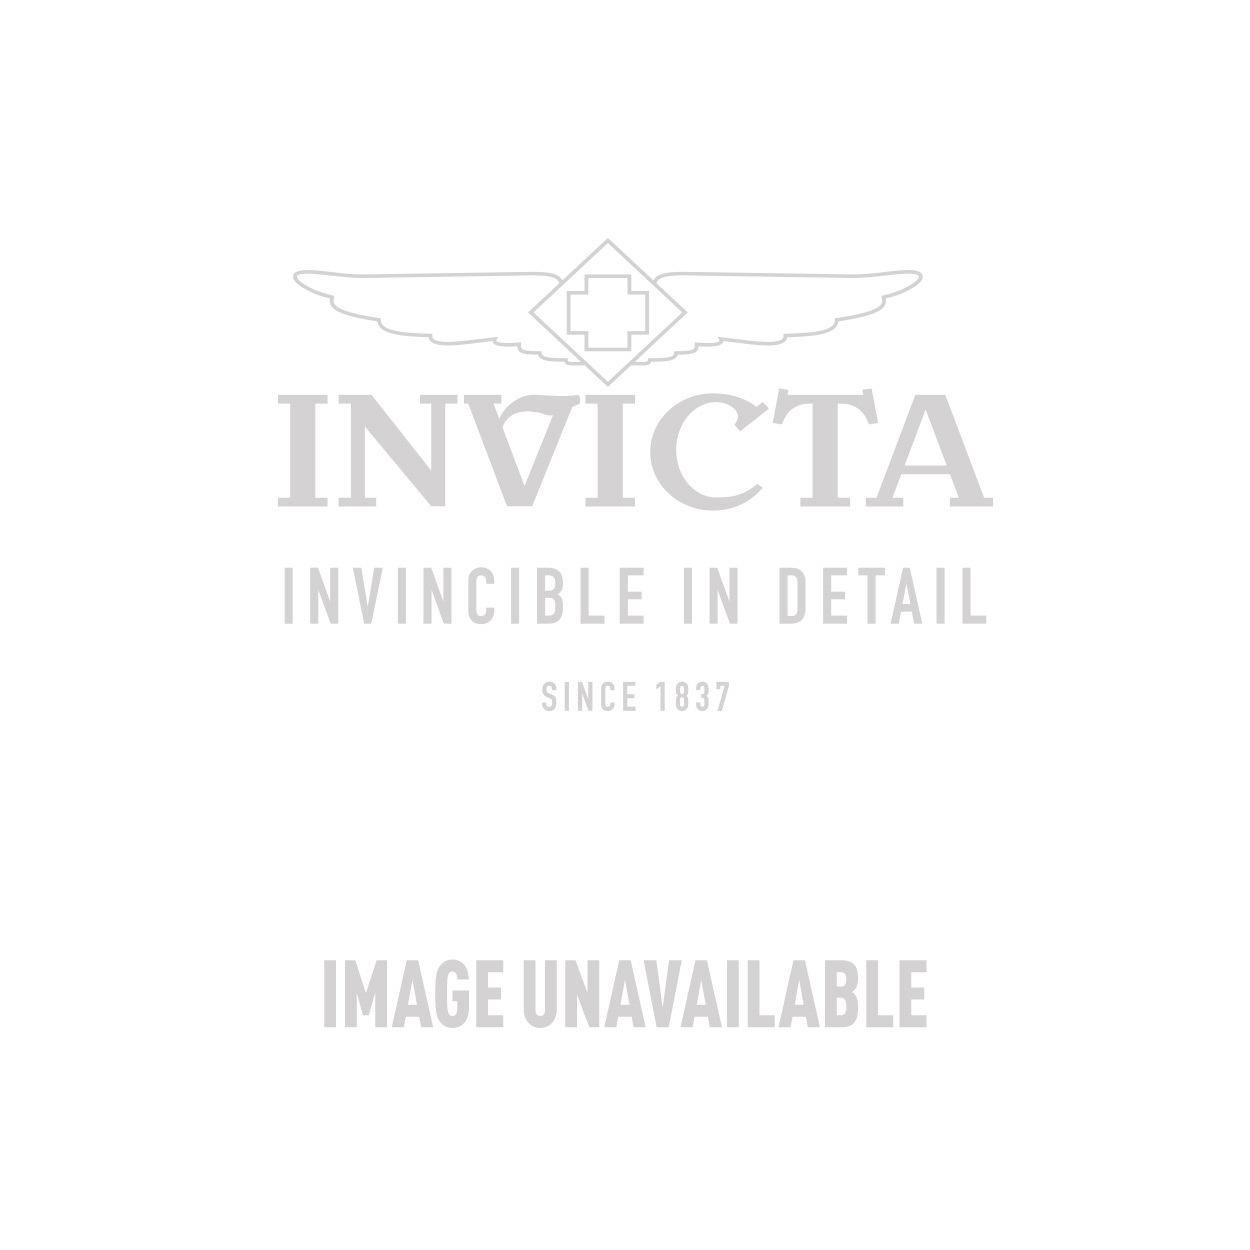 Invicta Sea Base Swiss Made Quartz Watch - Rose Gold, Black case with Rose Gold, Black tone Titanium band - Model 14289